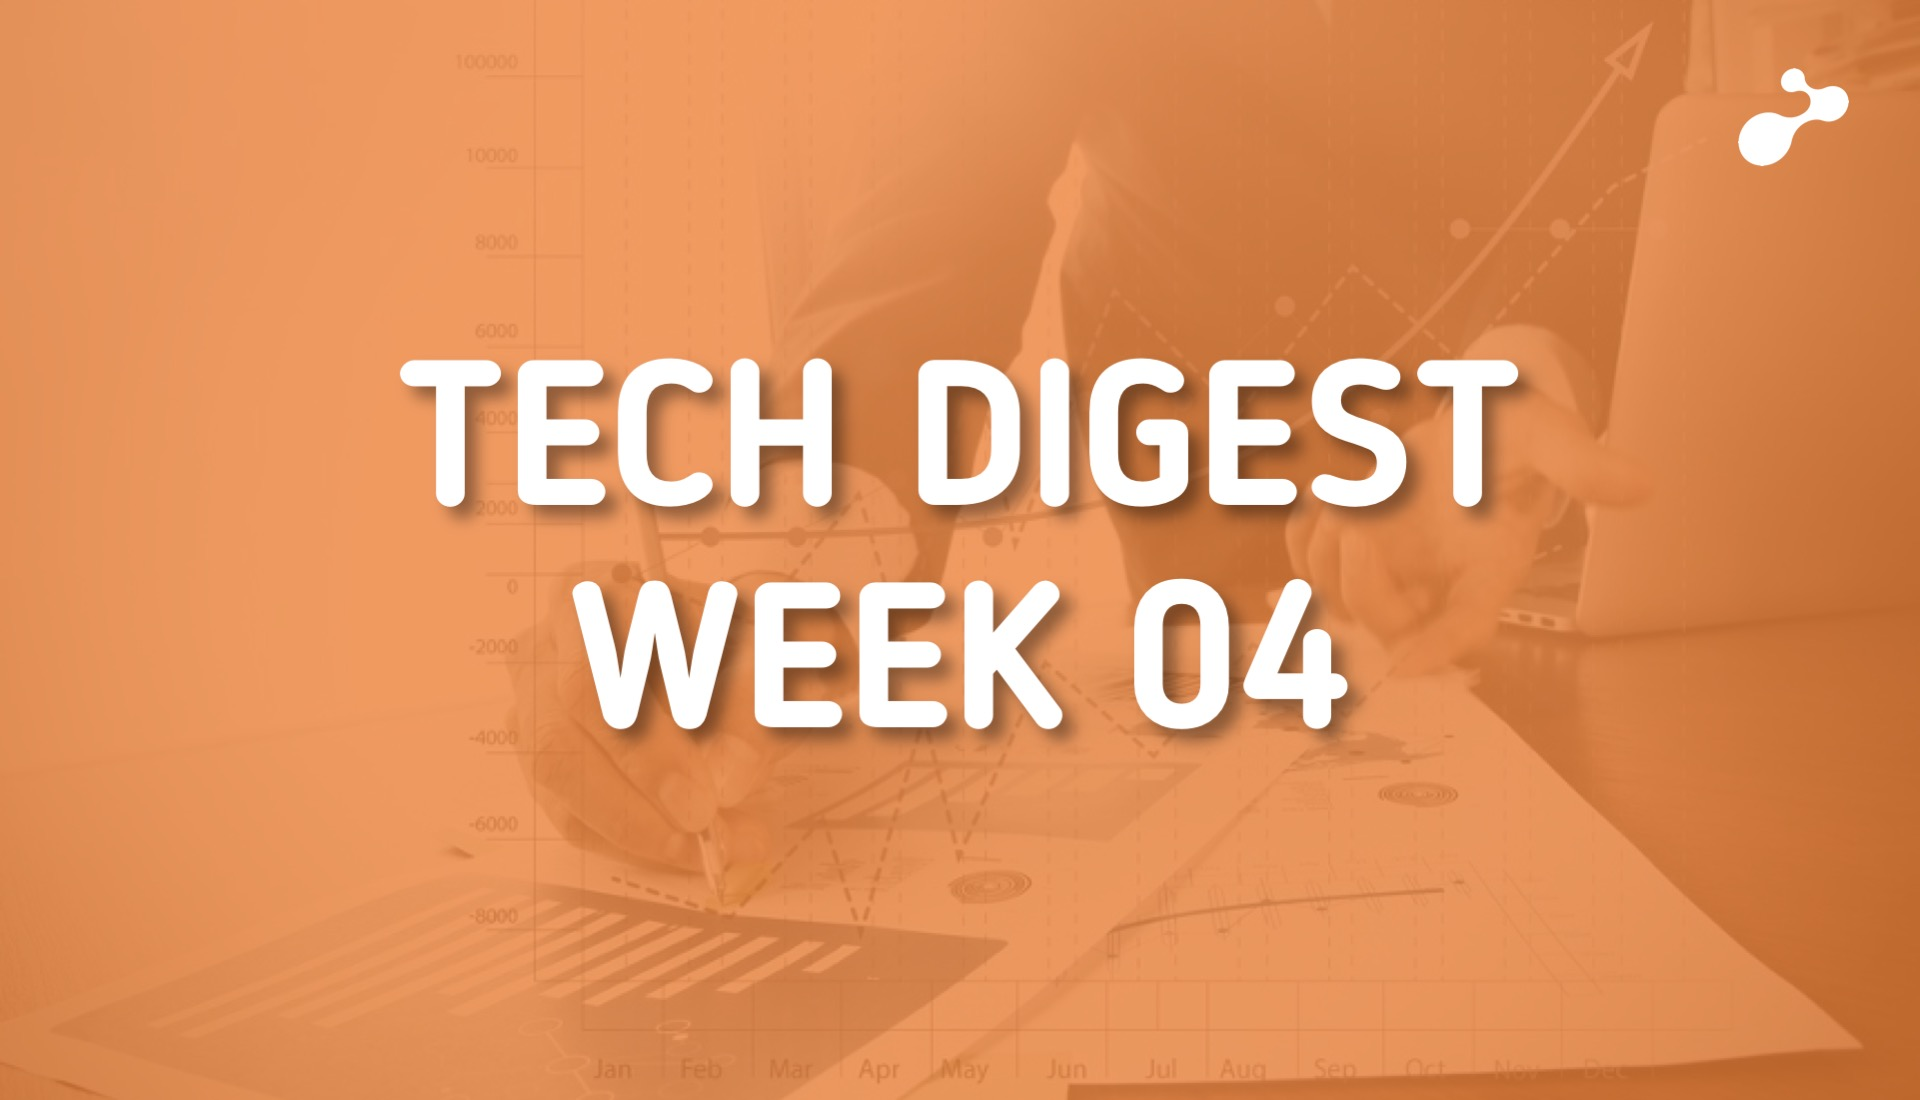 Technology news around the world - Week 04, 2019